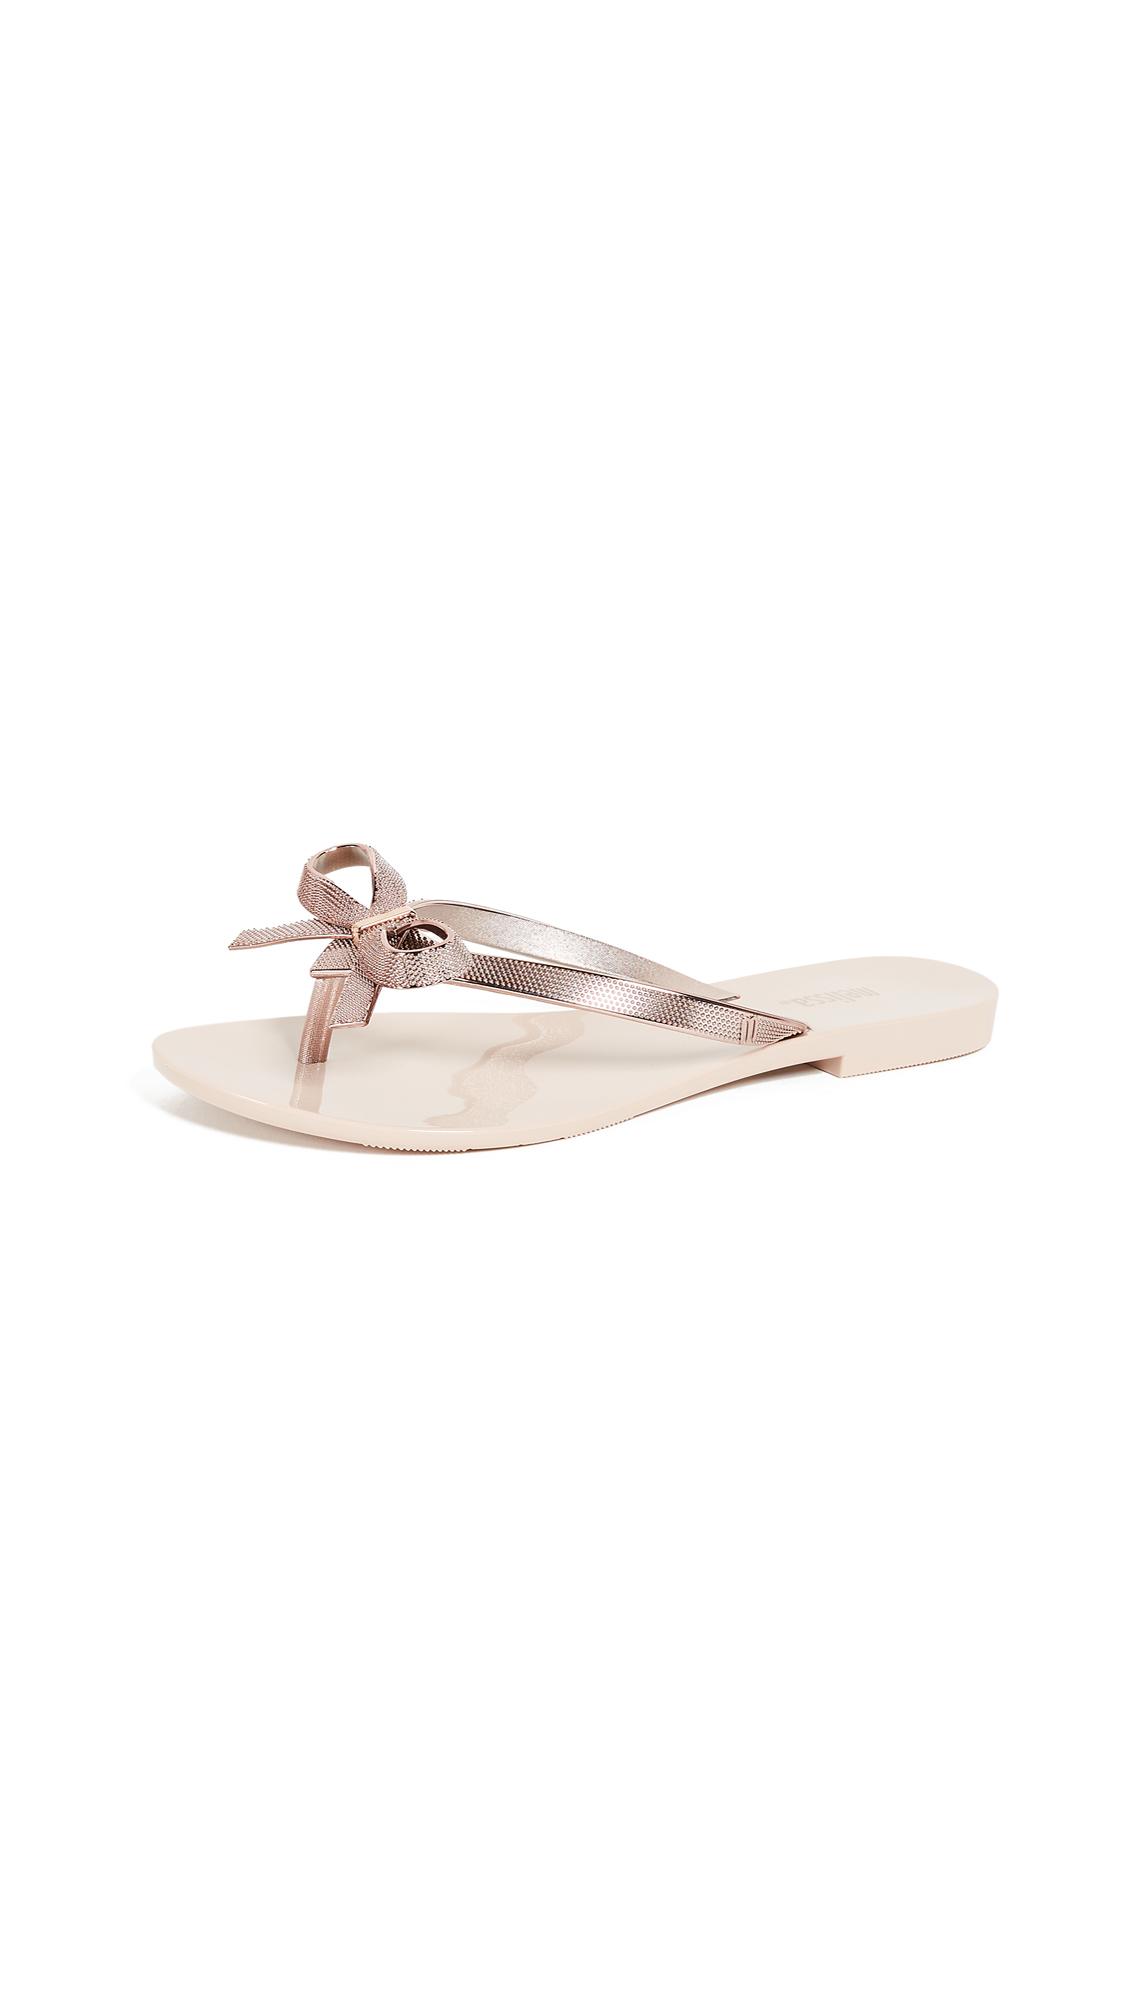 Melissa Harmonic Chrome II Bow Slides - Rose Gold